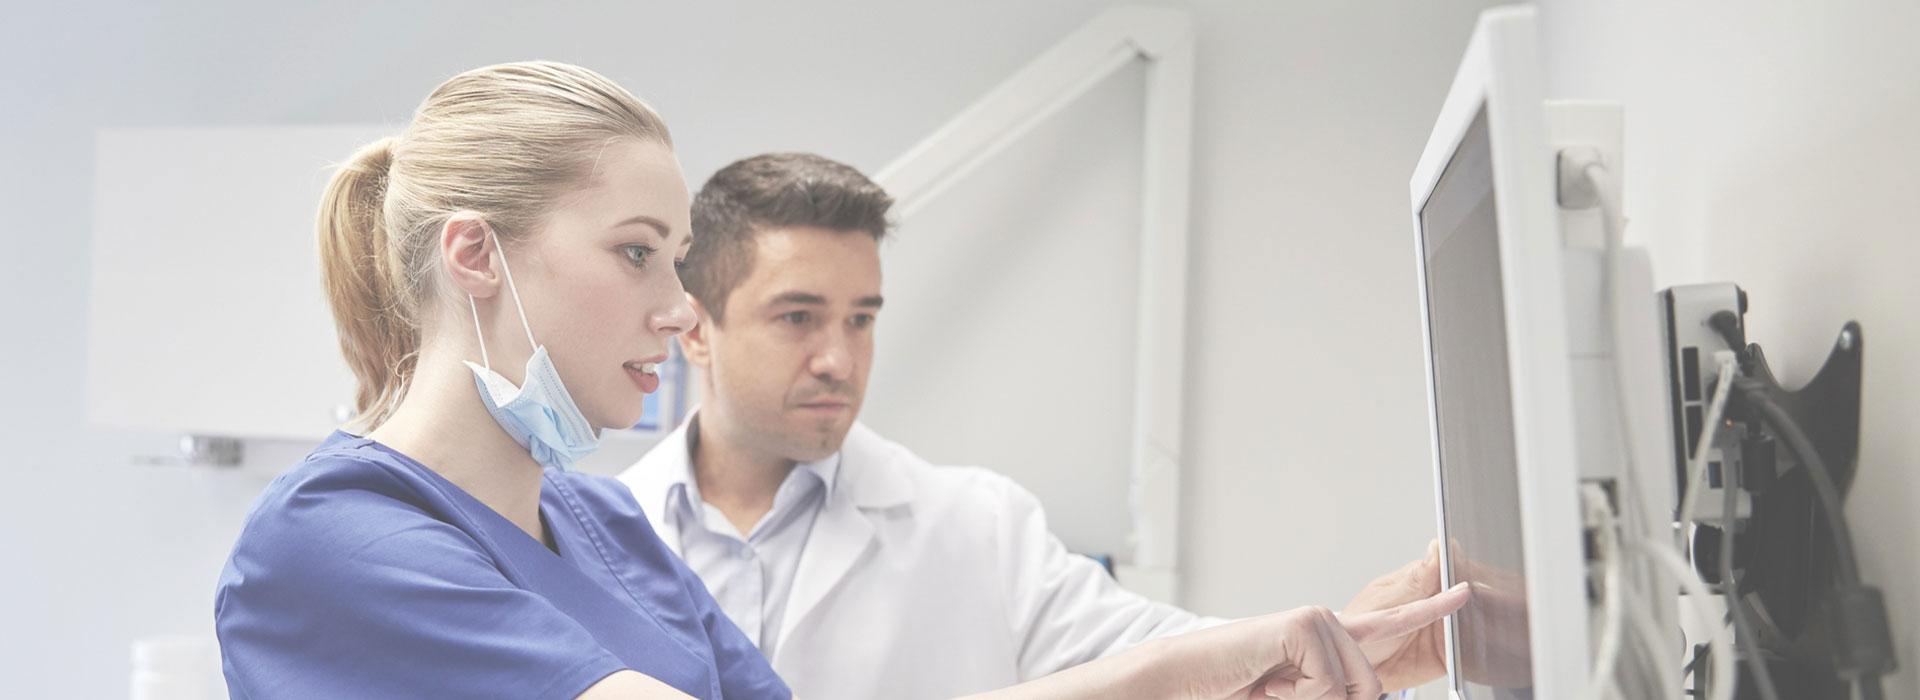 Dentist and nurse examining x-ray results